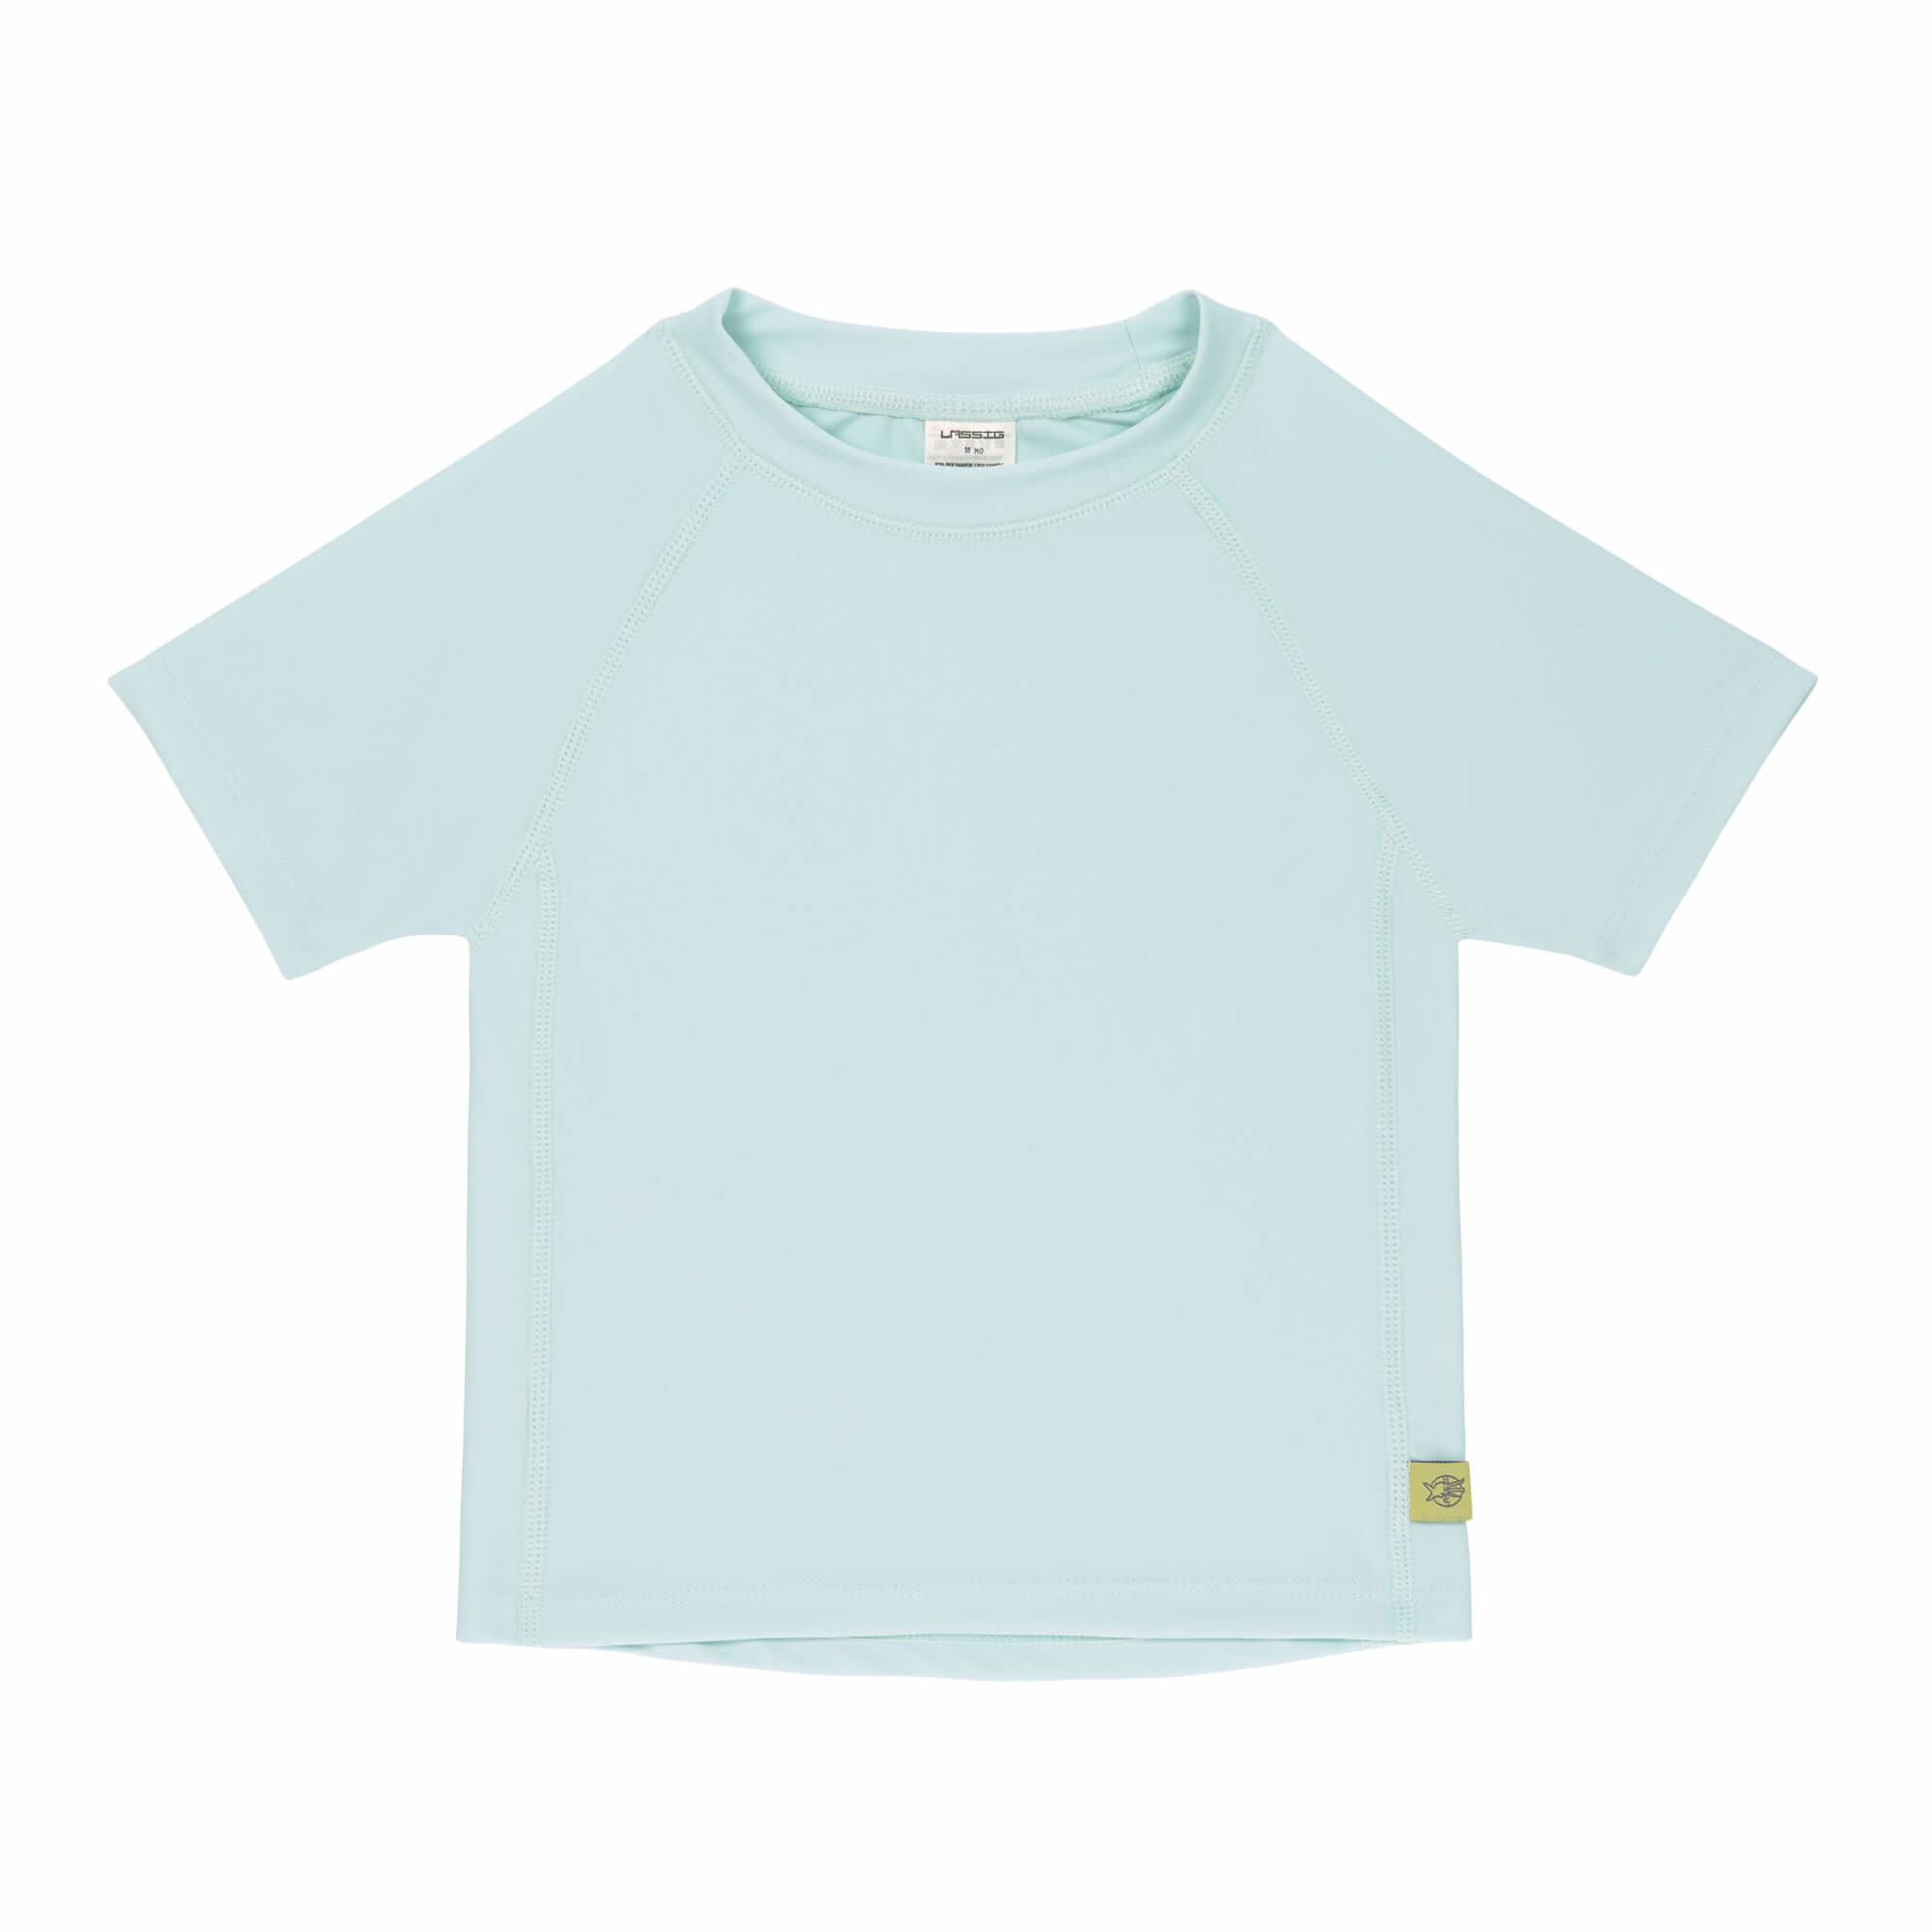 Lässig Lässig Splash & Fun Korte mouw Rashguard / zwemshirt - mint